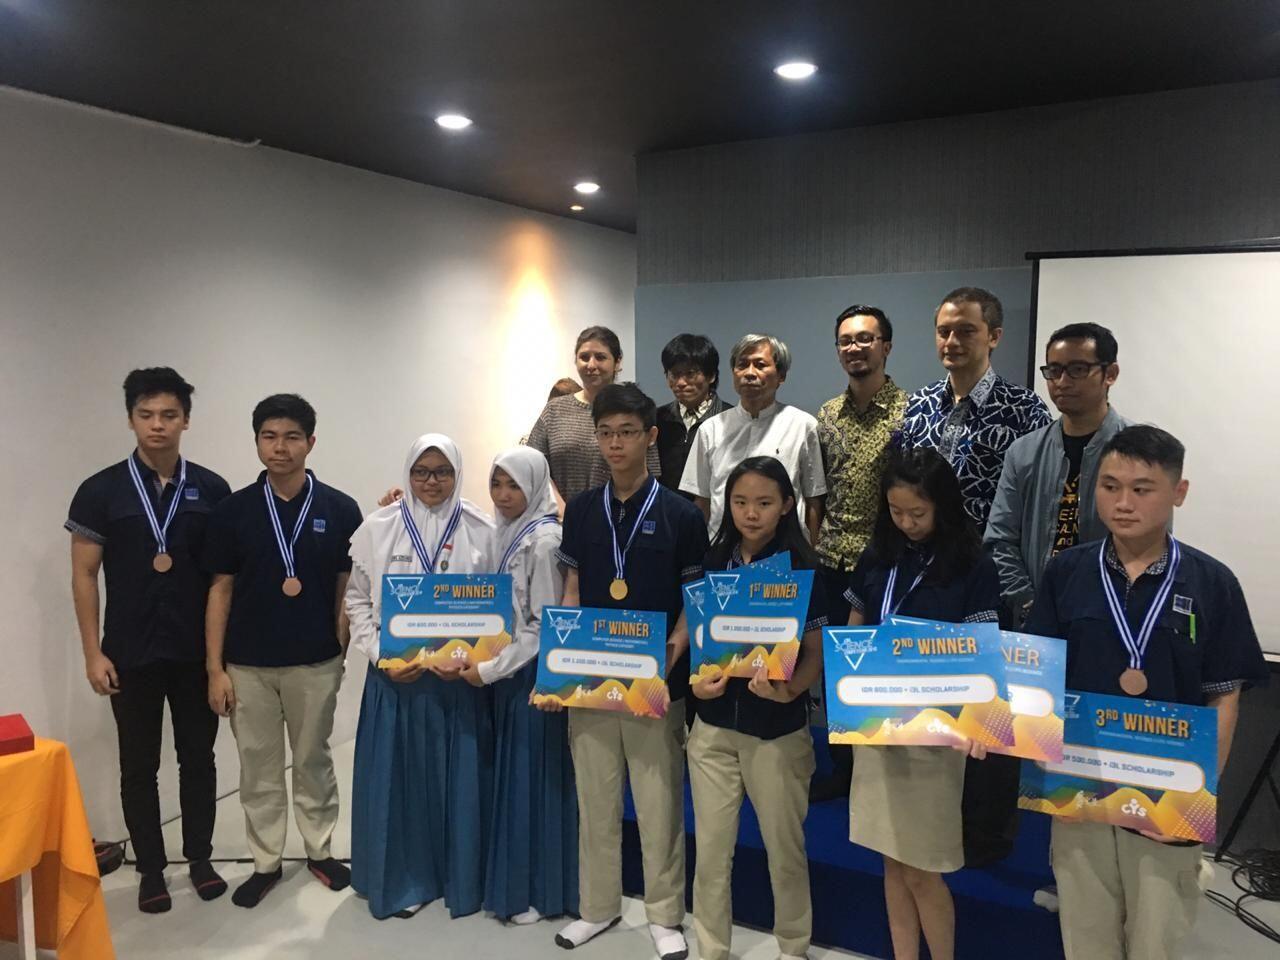 Super Kreatif! Pameran Karya Sains Siswa Se-Jawa Timur oleh Krya.id